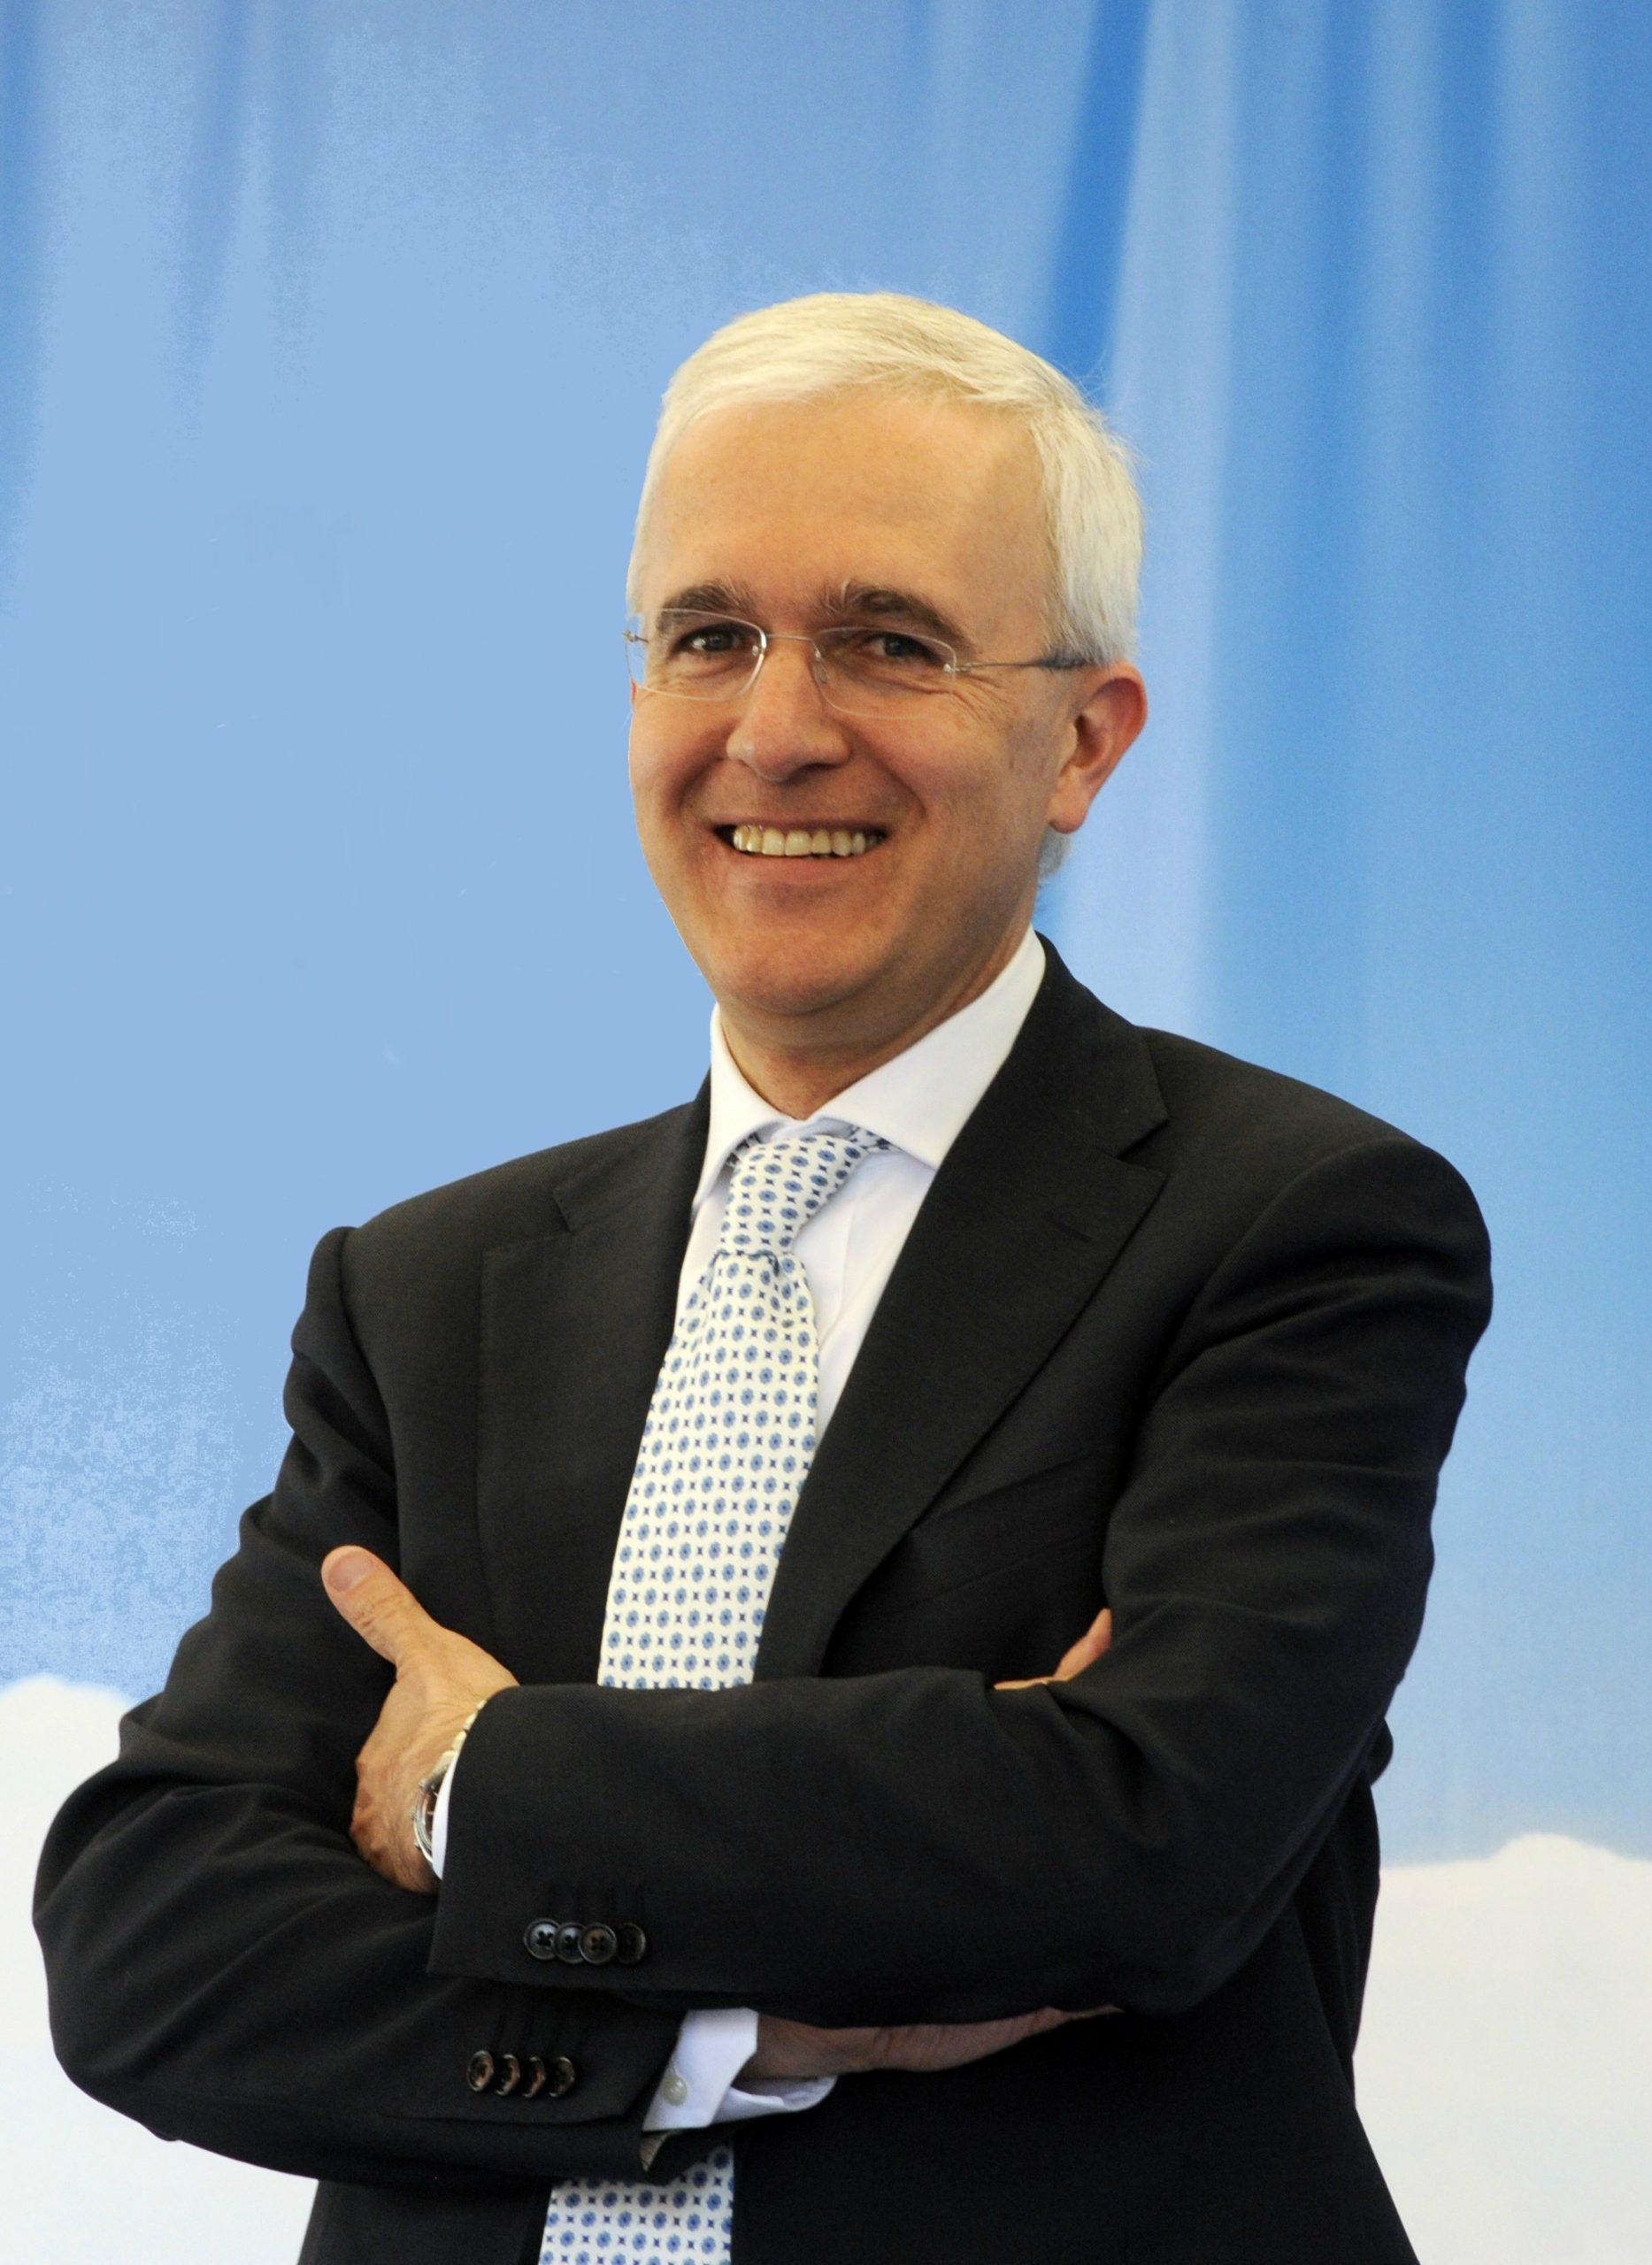 Avatar Giovanni Valotti